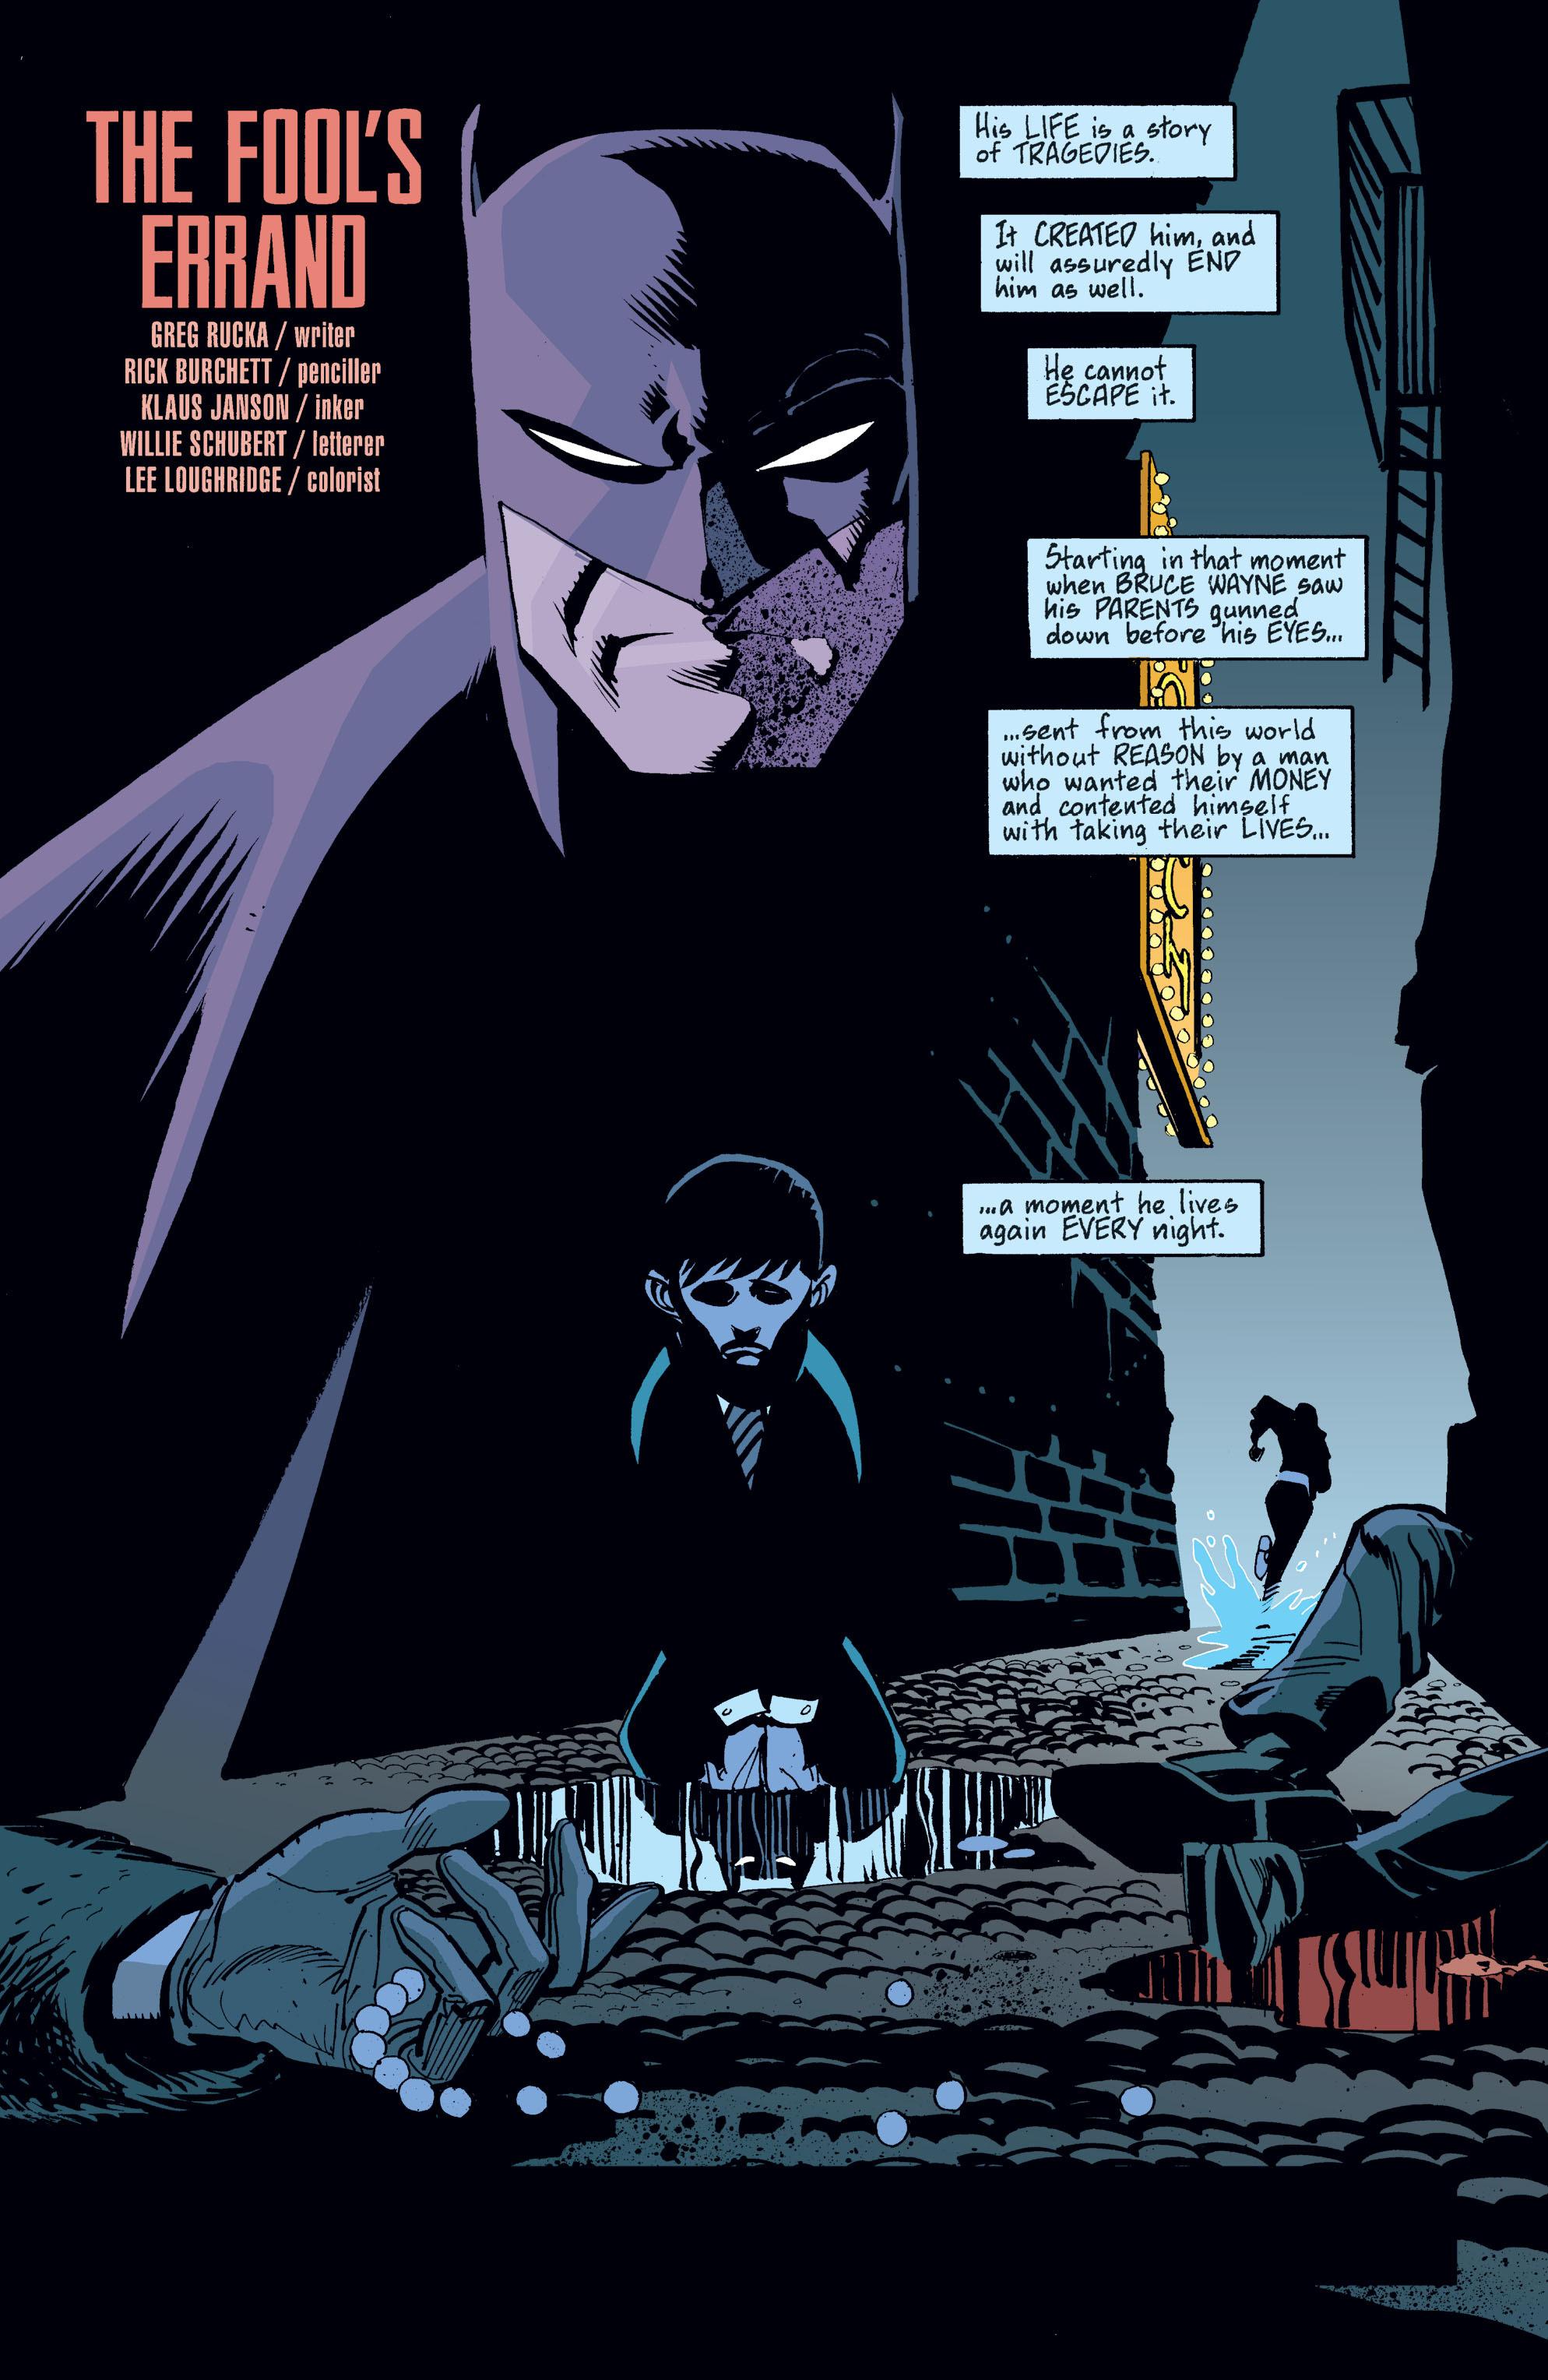 Psychology of Bruce Wayne HHjTSZWugheUjHXm_kwNYmEw6w5Av3TvaLz0h1PAT1BS4naCxI2ehAElIgklAtHjGAJqH9rRrw3X=s0